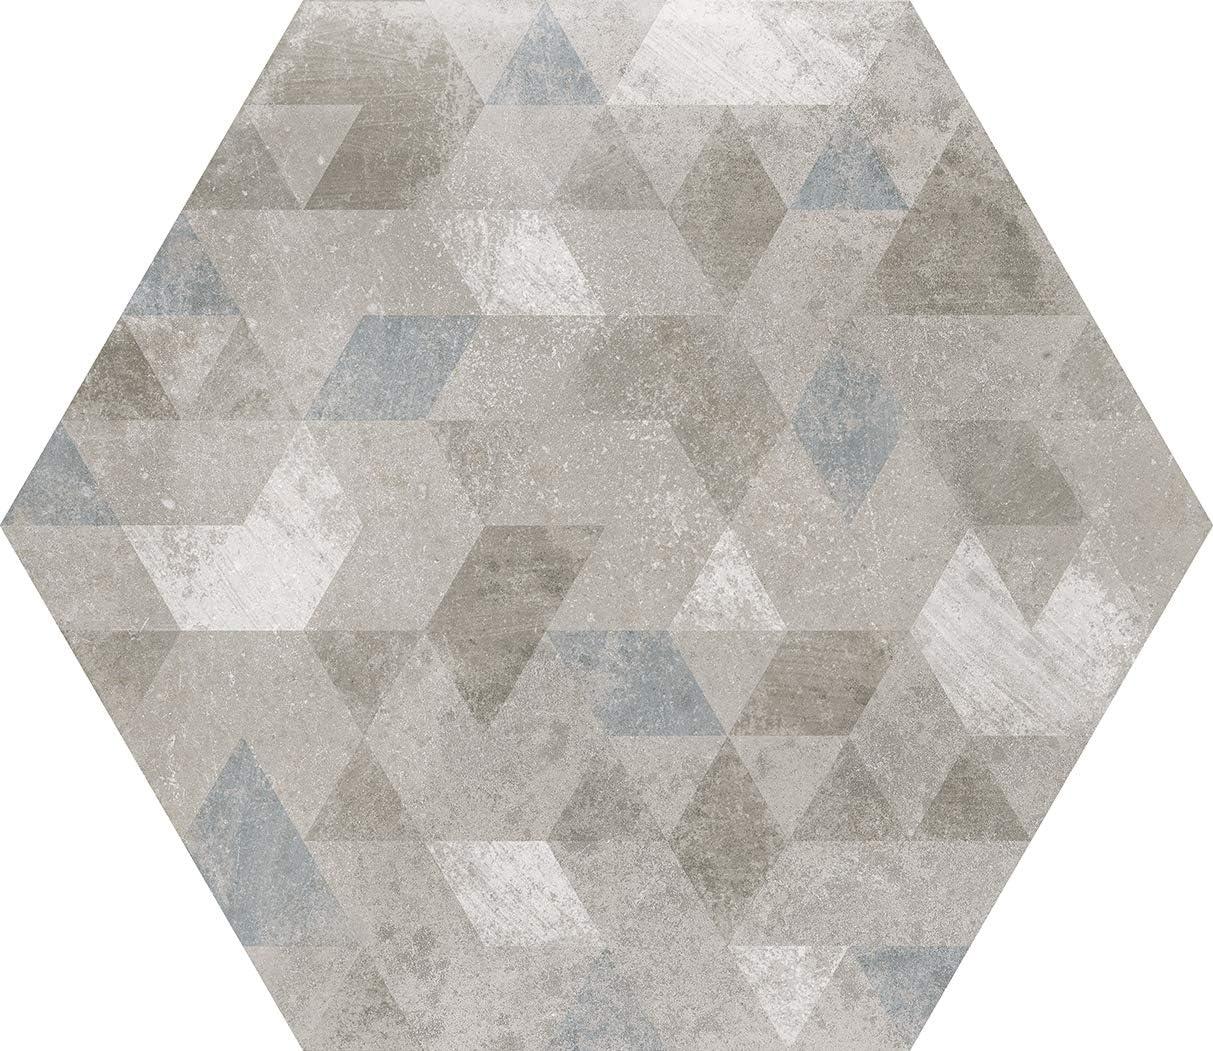 Color Grey Antislip Colecci/ón Micro Nais - Caja de 1 m2 Baldosas cer/ámicas para suelos 25 piezas 20x20 cm